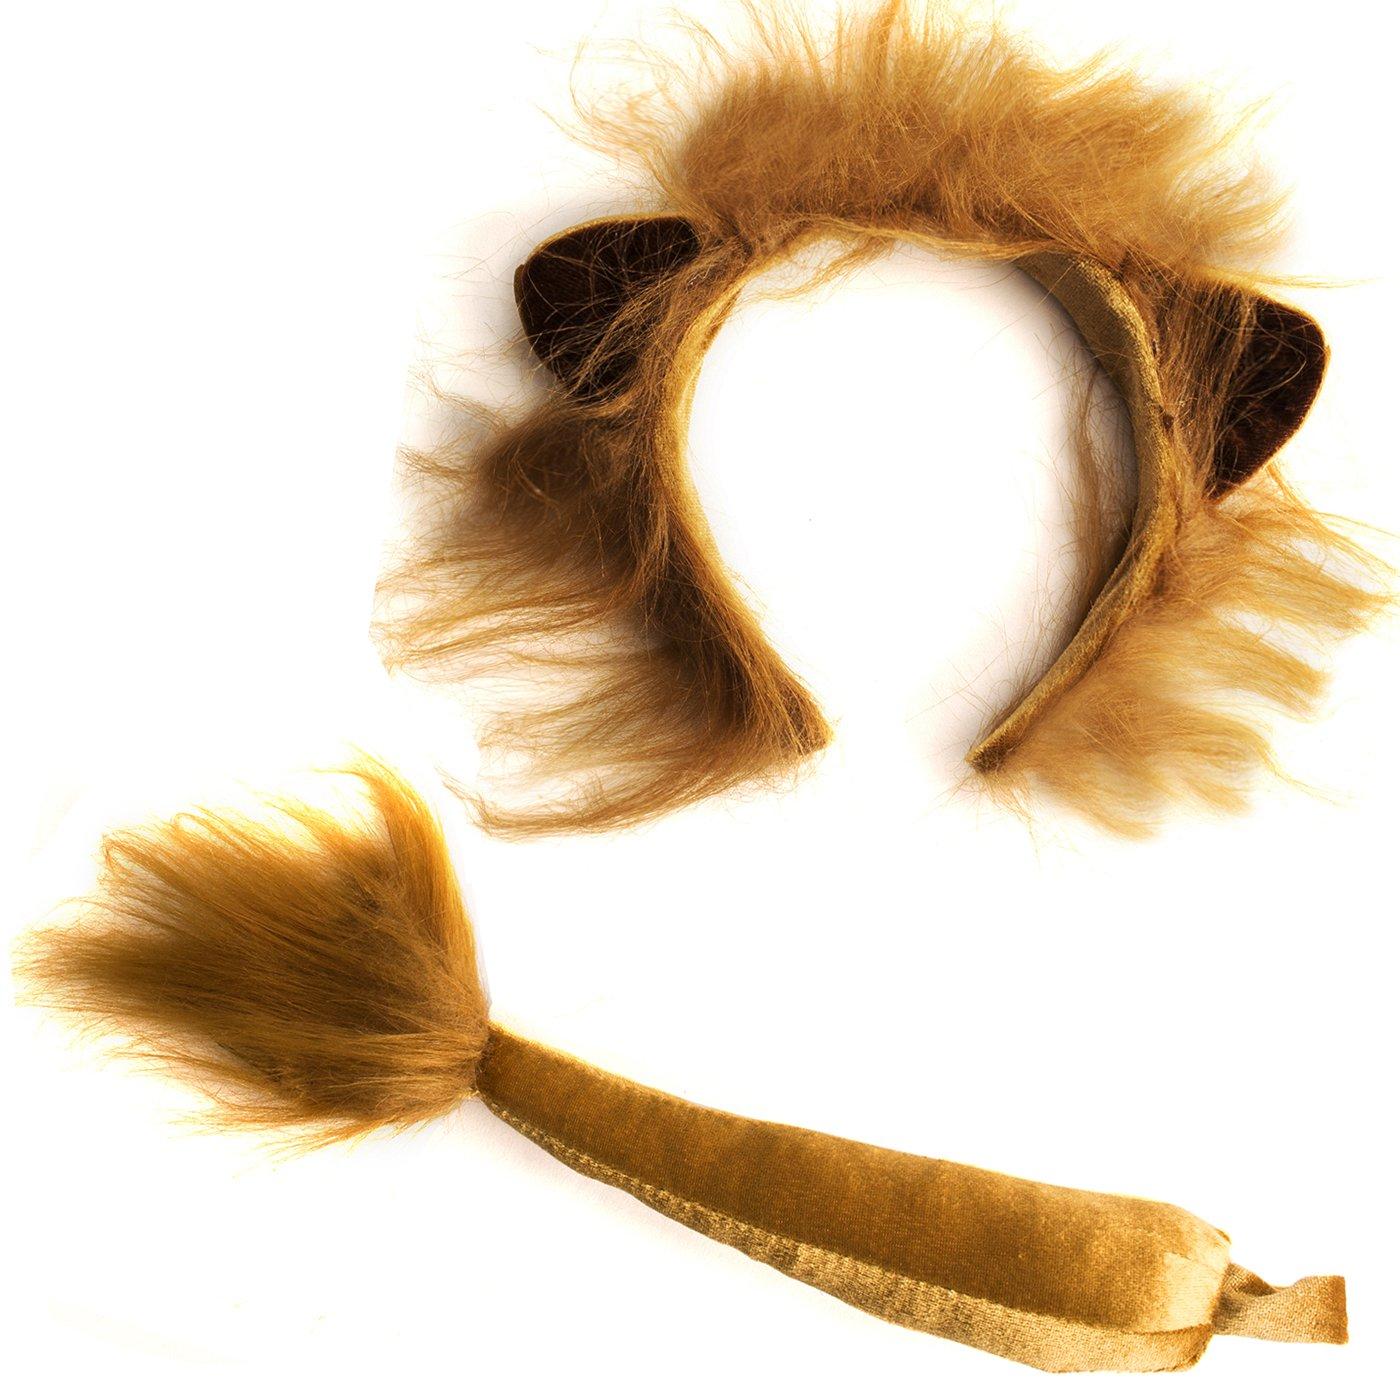 Amazon.com  Funny Party Hats Lion Ears and Tail Set - Lion Costume - Ears  Headband - Animal Headbands with Ears (Lion Ears   Tail Set)  Clothing 722664a686a5